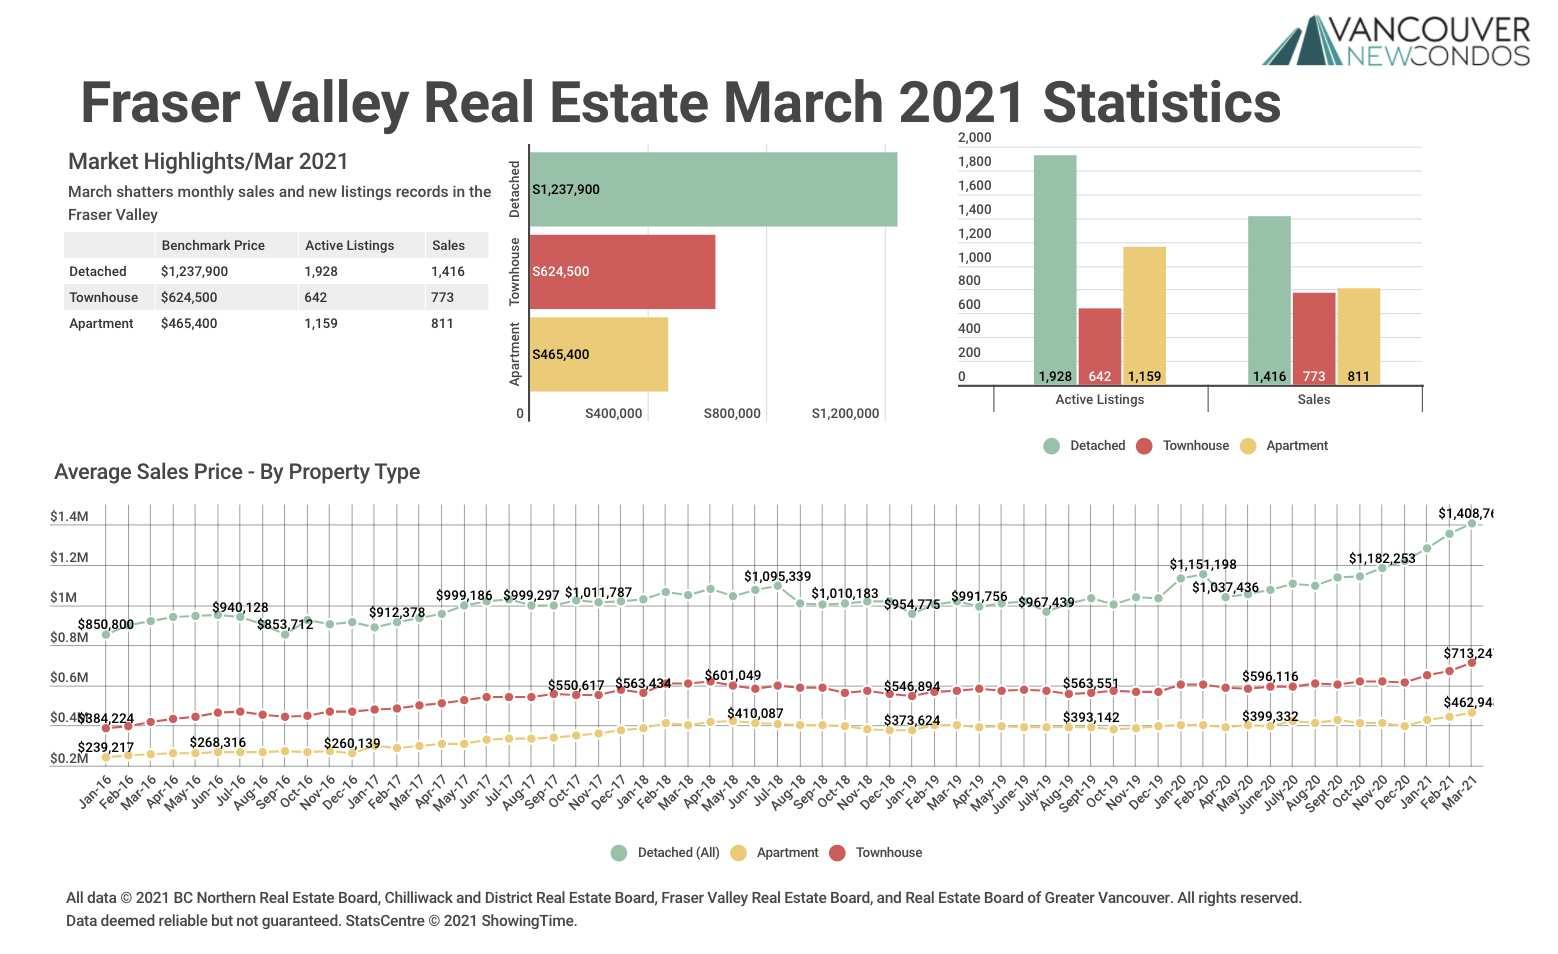 FVREB Mar 21 graph